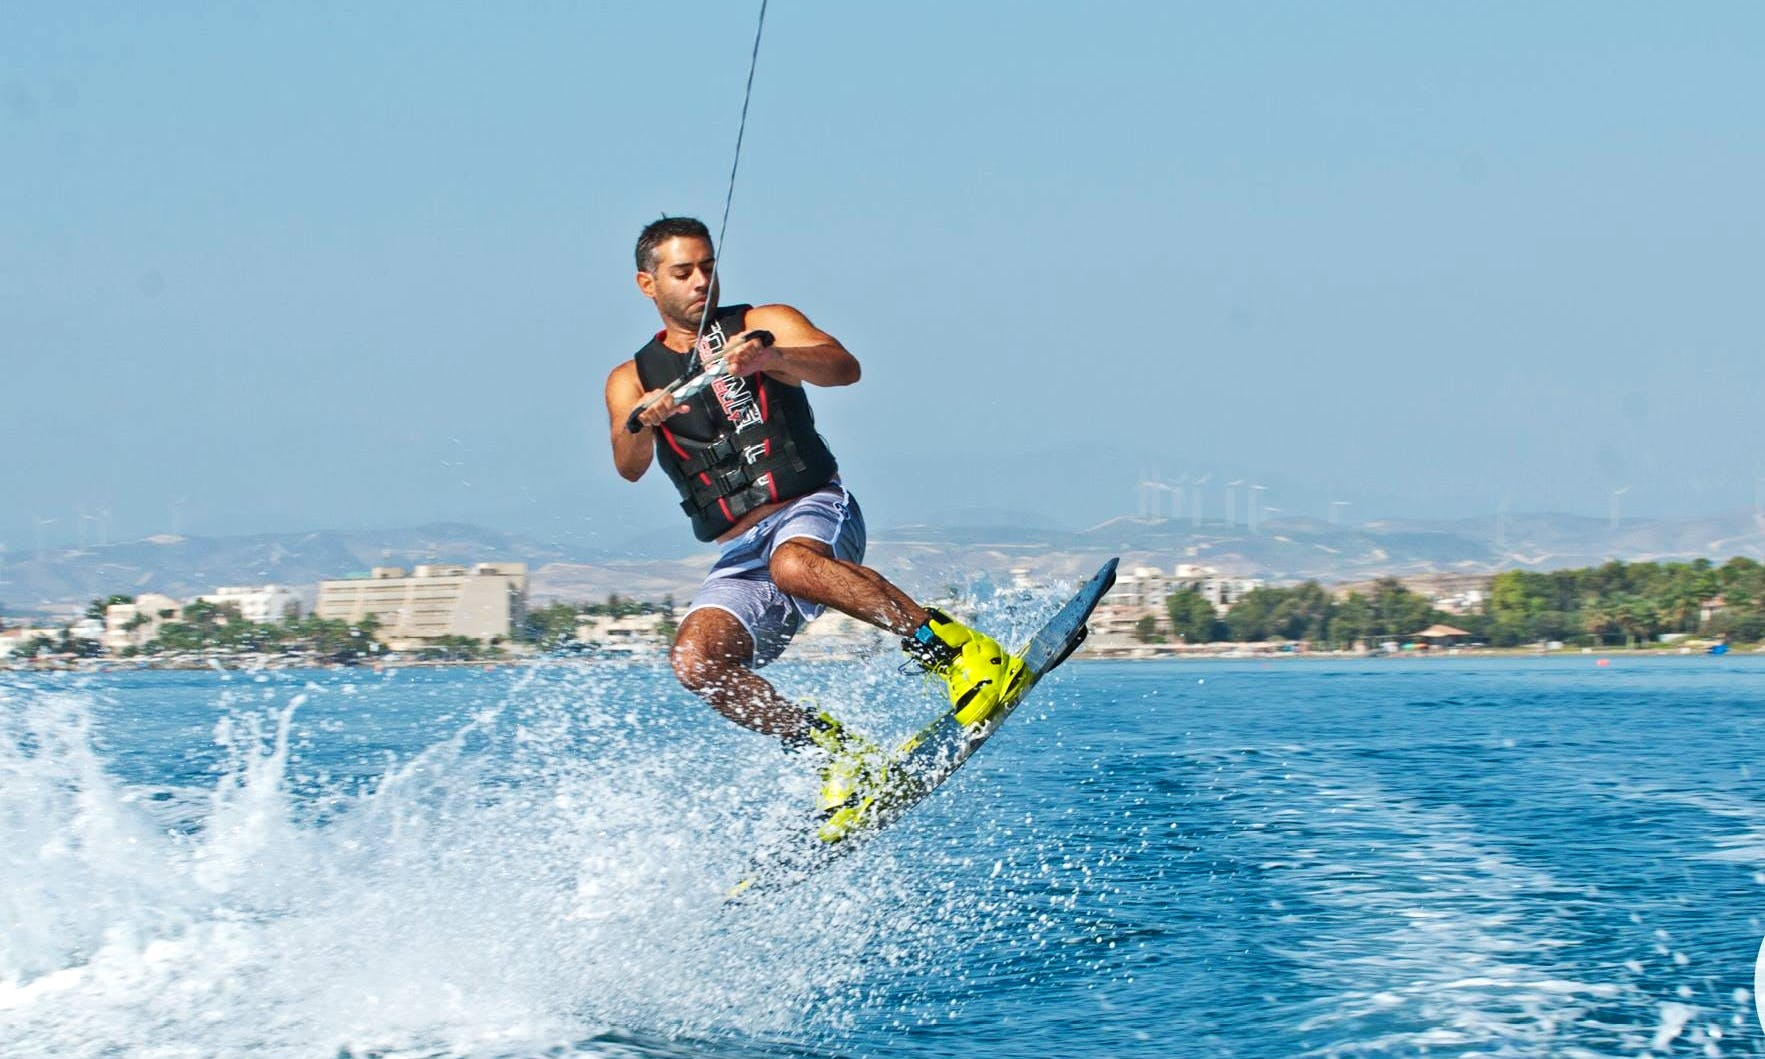 Enjoy Wakeboarding in Oroklini, Larnaca